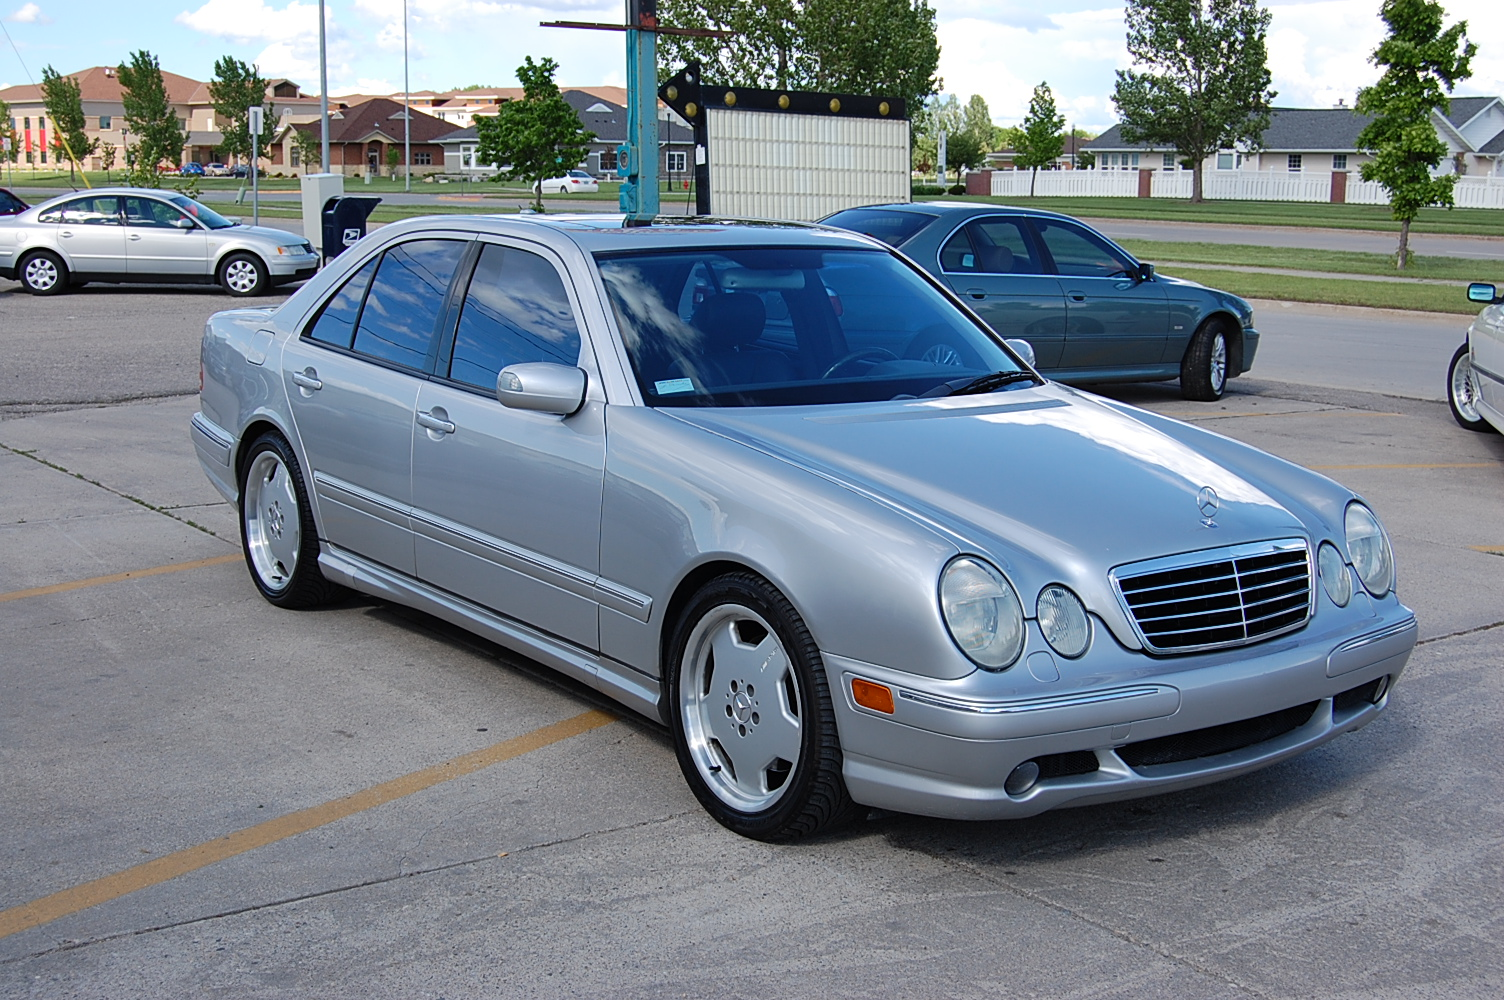 Mercedes benz e 55 amg technical details history photos for Mercedes benz complaint department